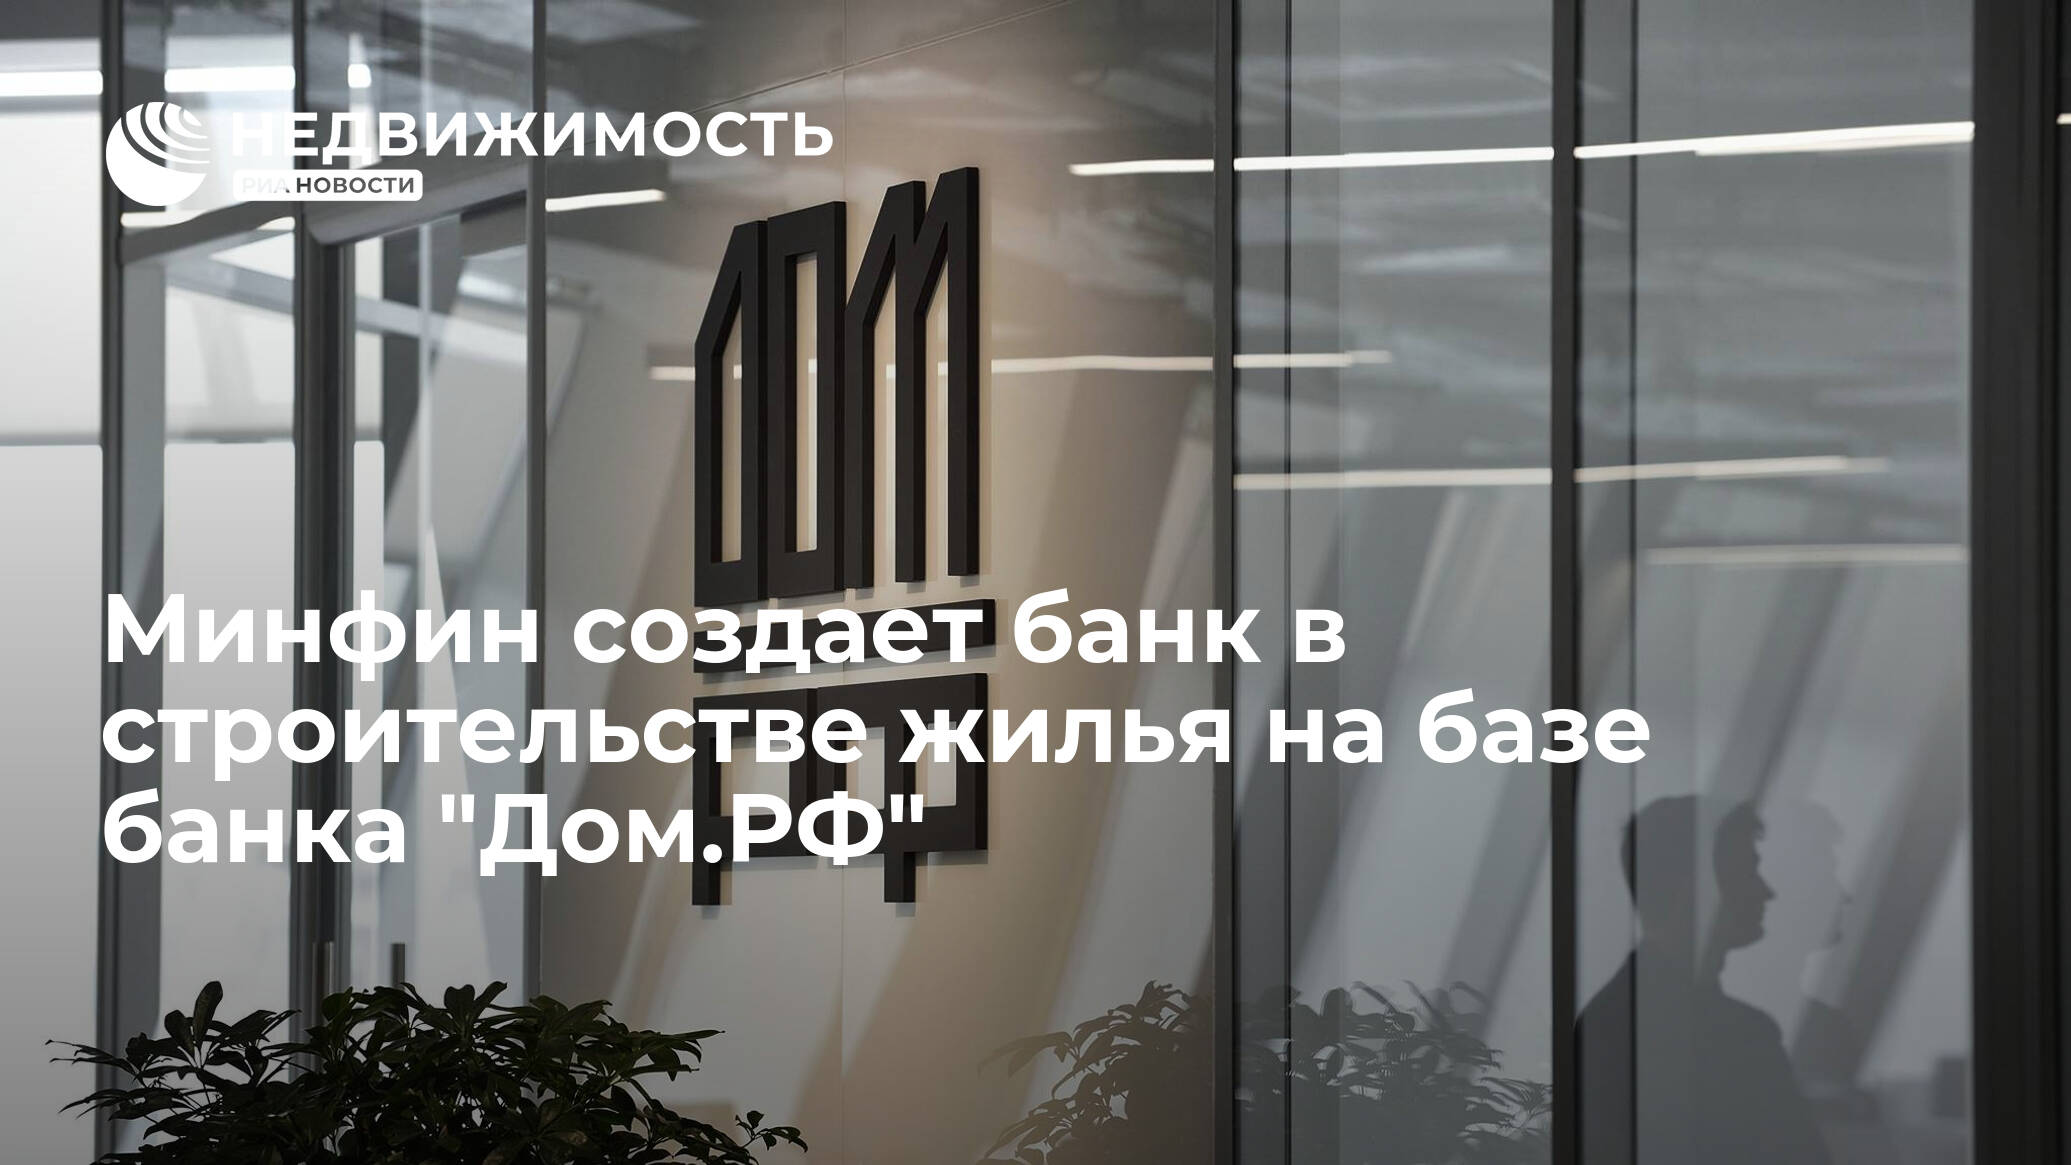 realty.ria.ru